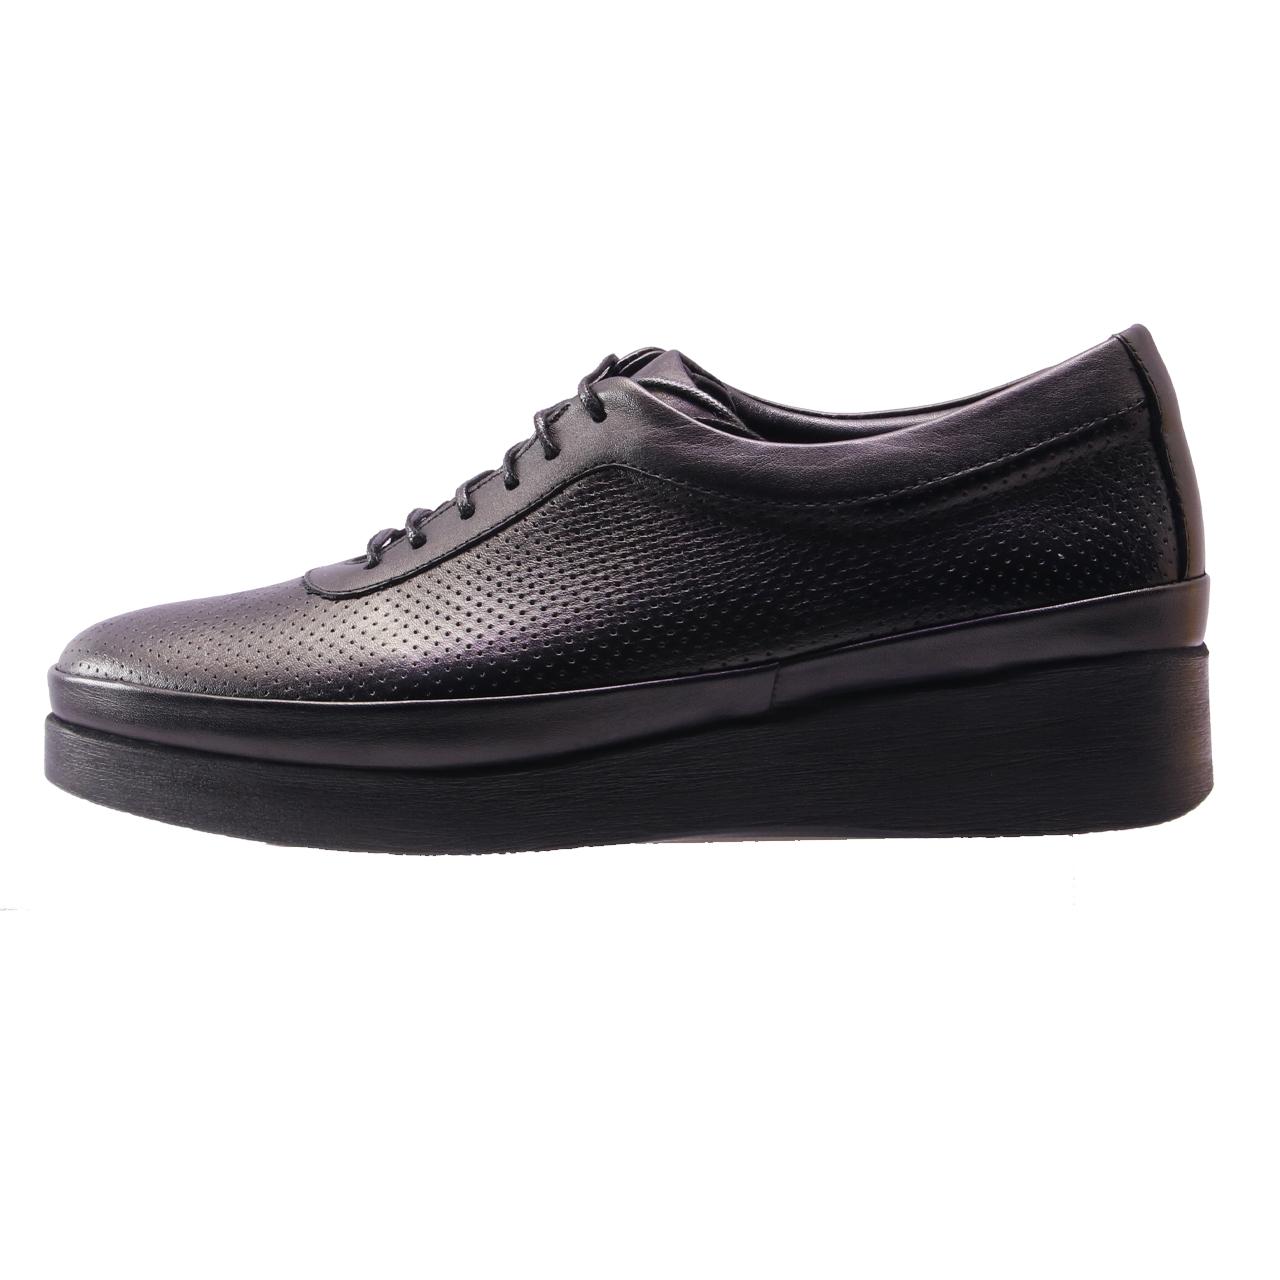 کفش روزمره زنانه پاتکان کد 80002